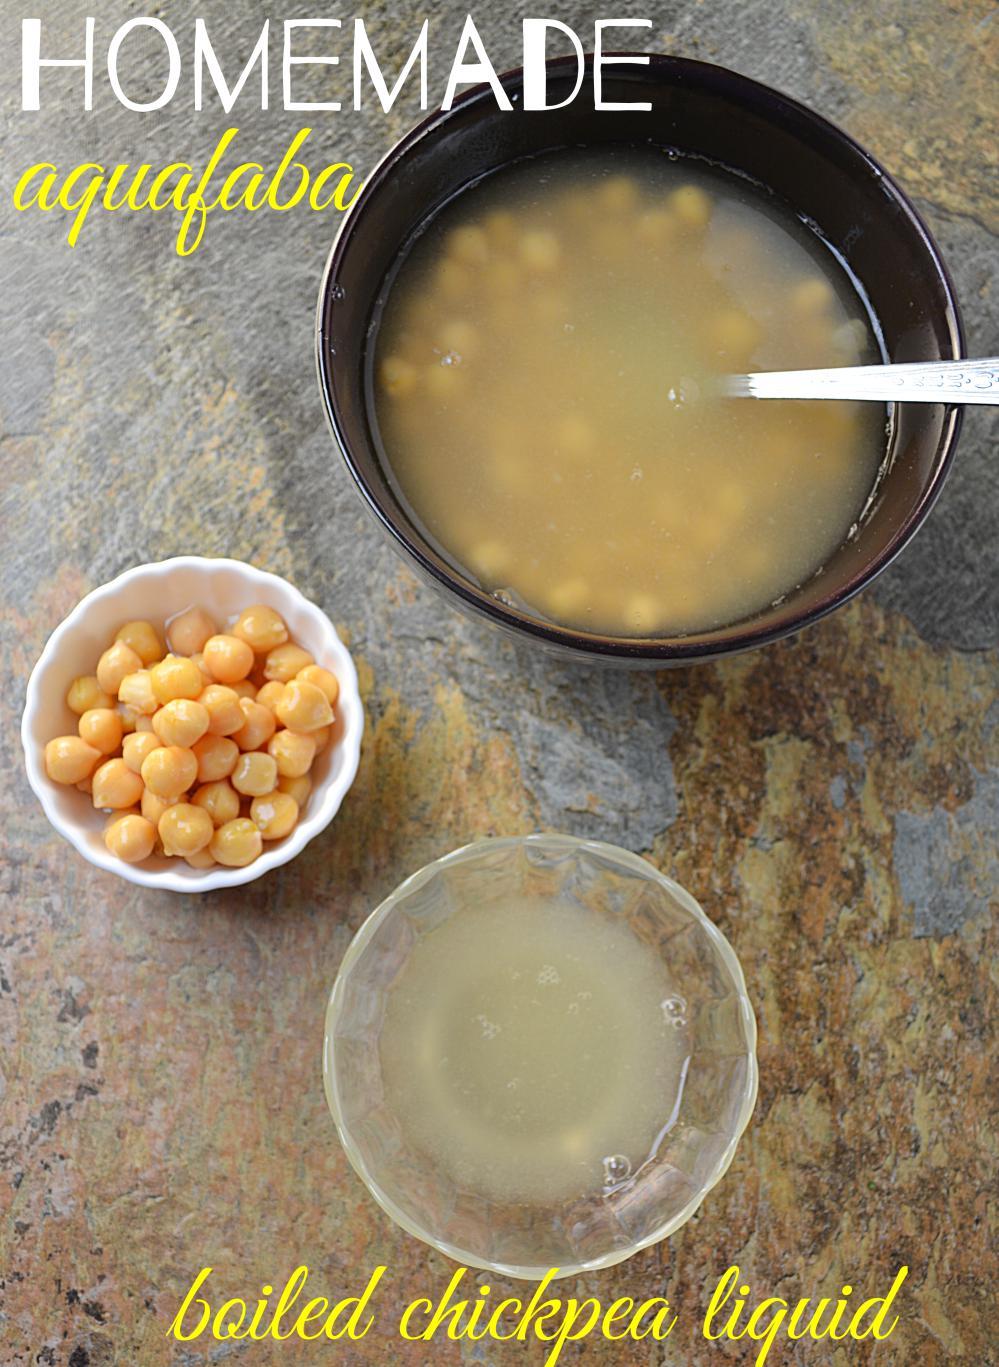 Homemade Eggless Mayonnaise Recipe